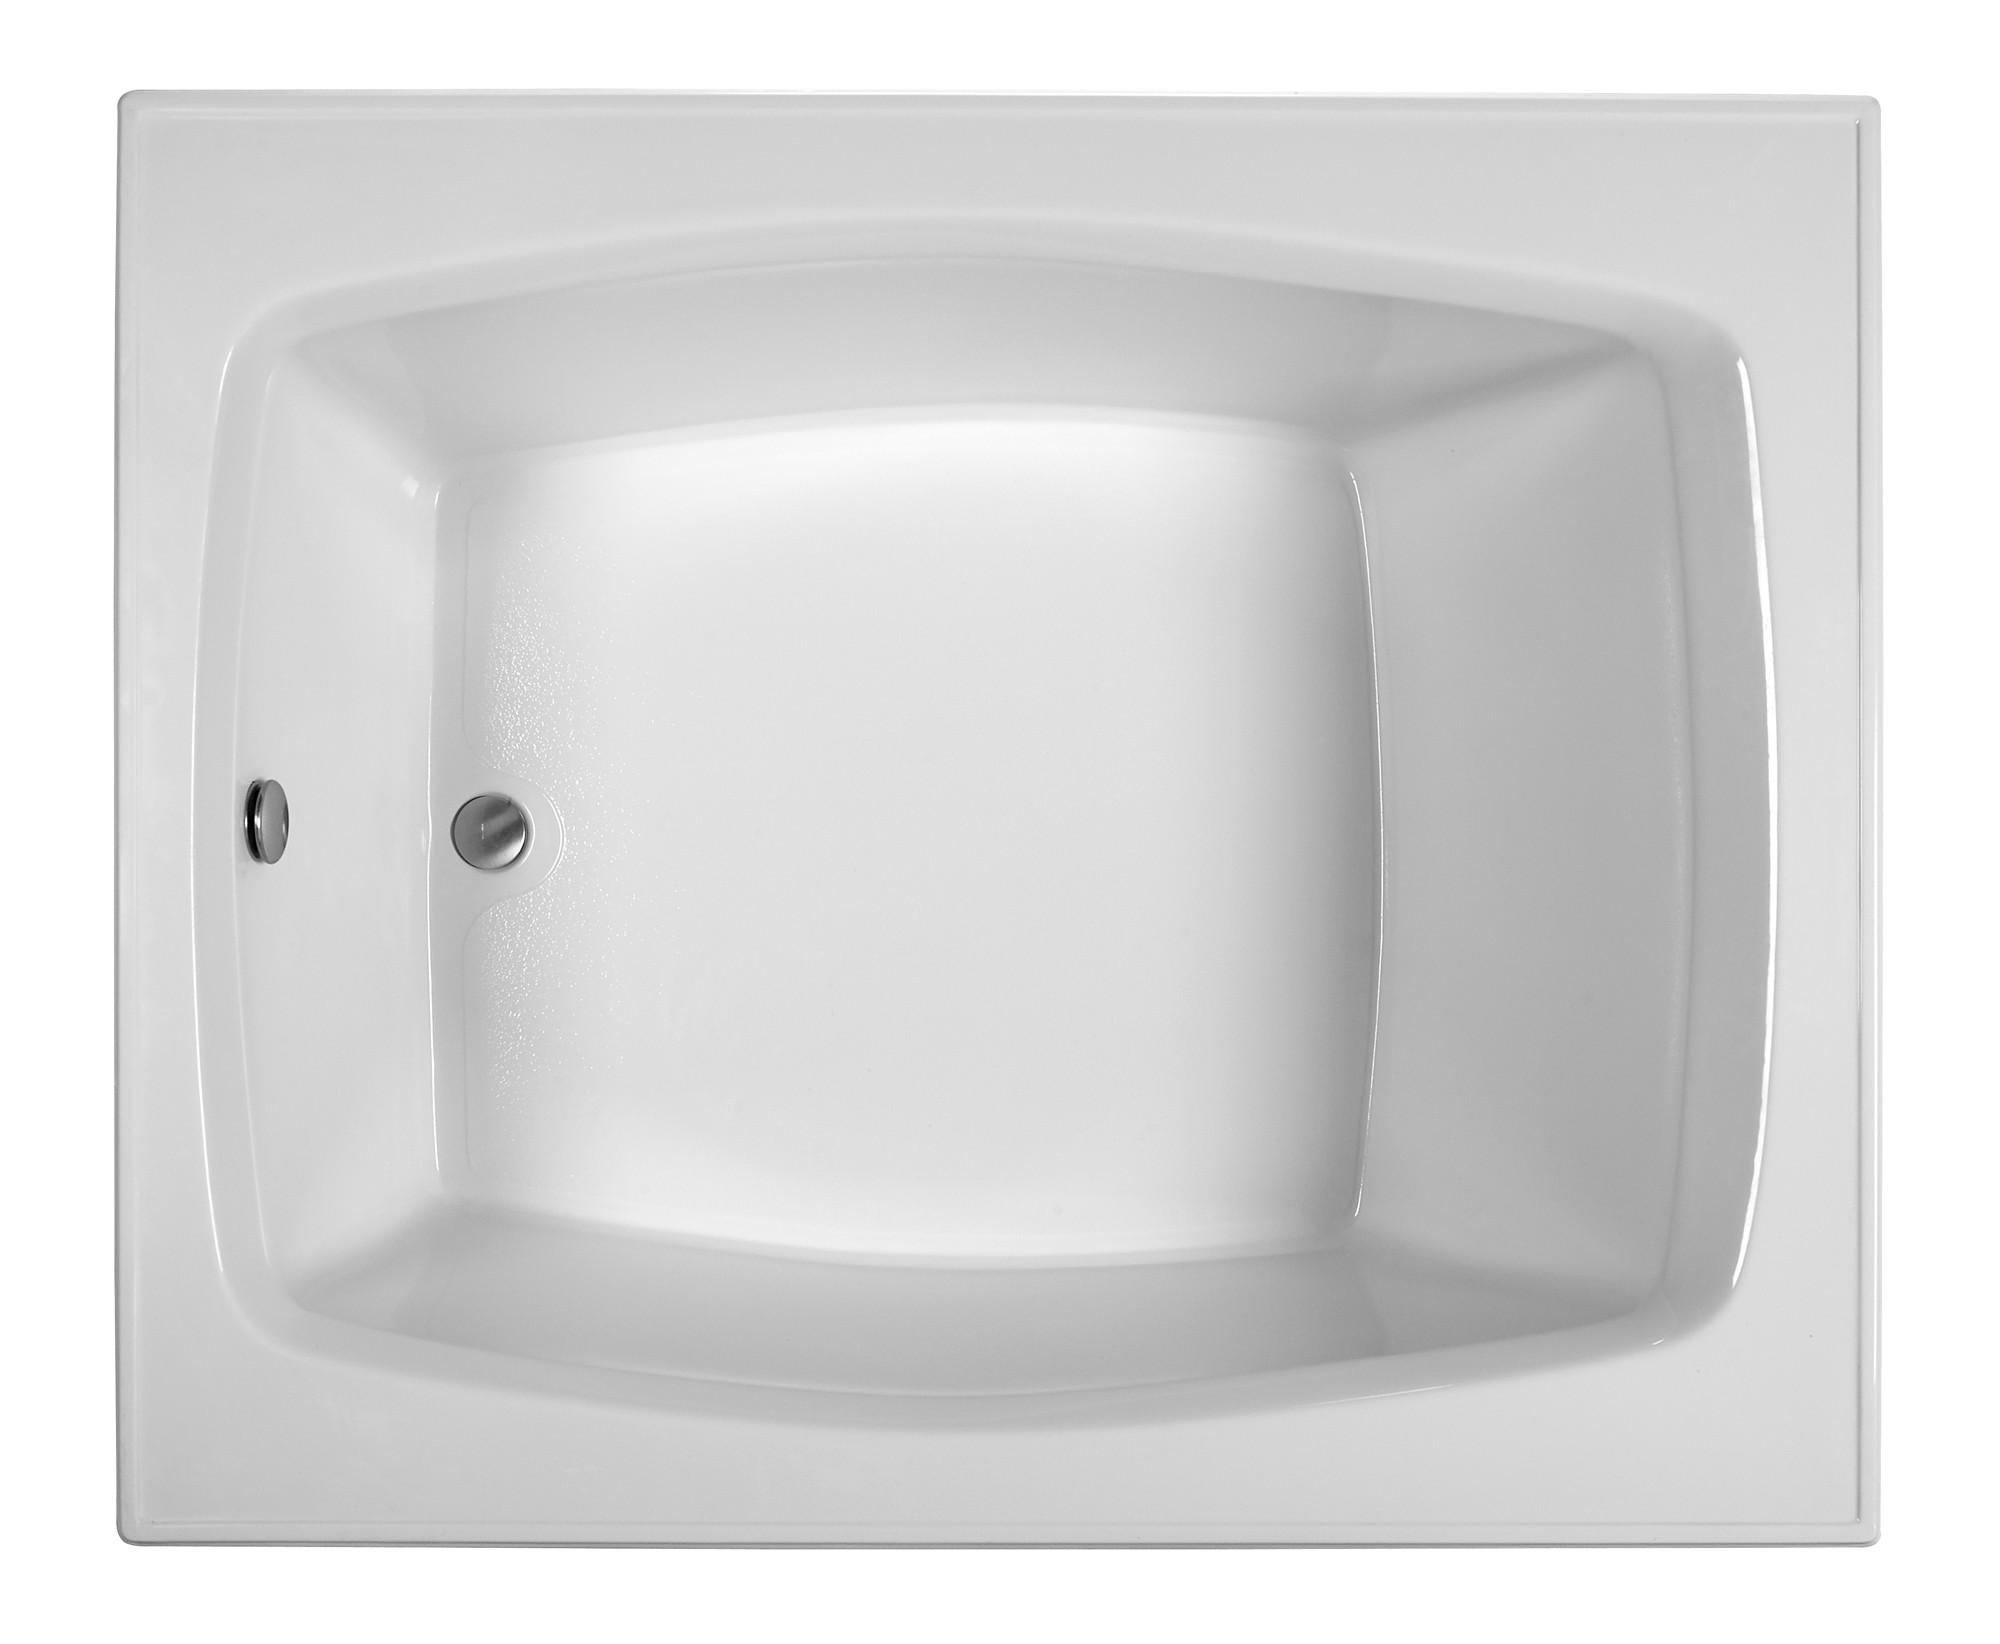 Reliance R6048ERXW 59.25 Inch Rectangular End Drain Whirlpool Bath